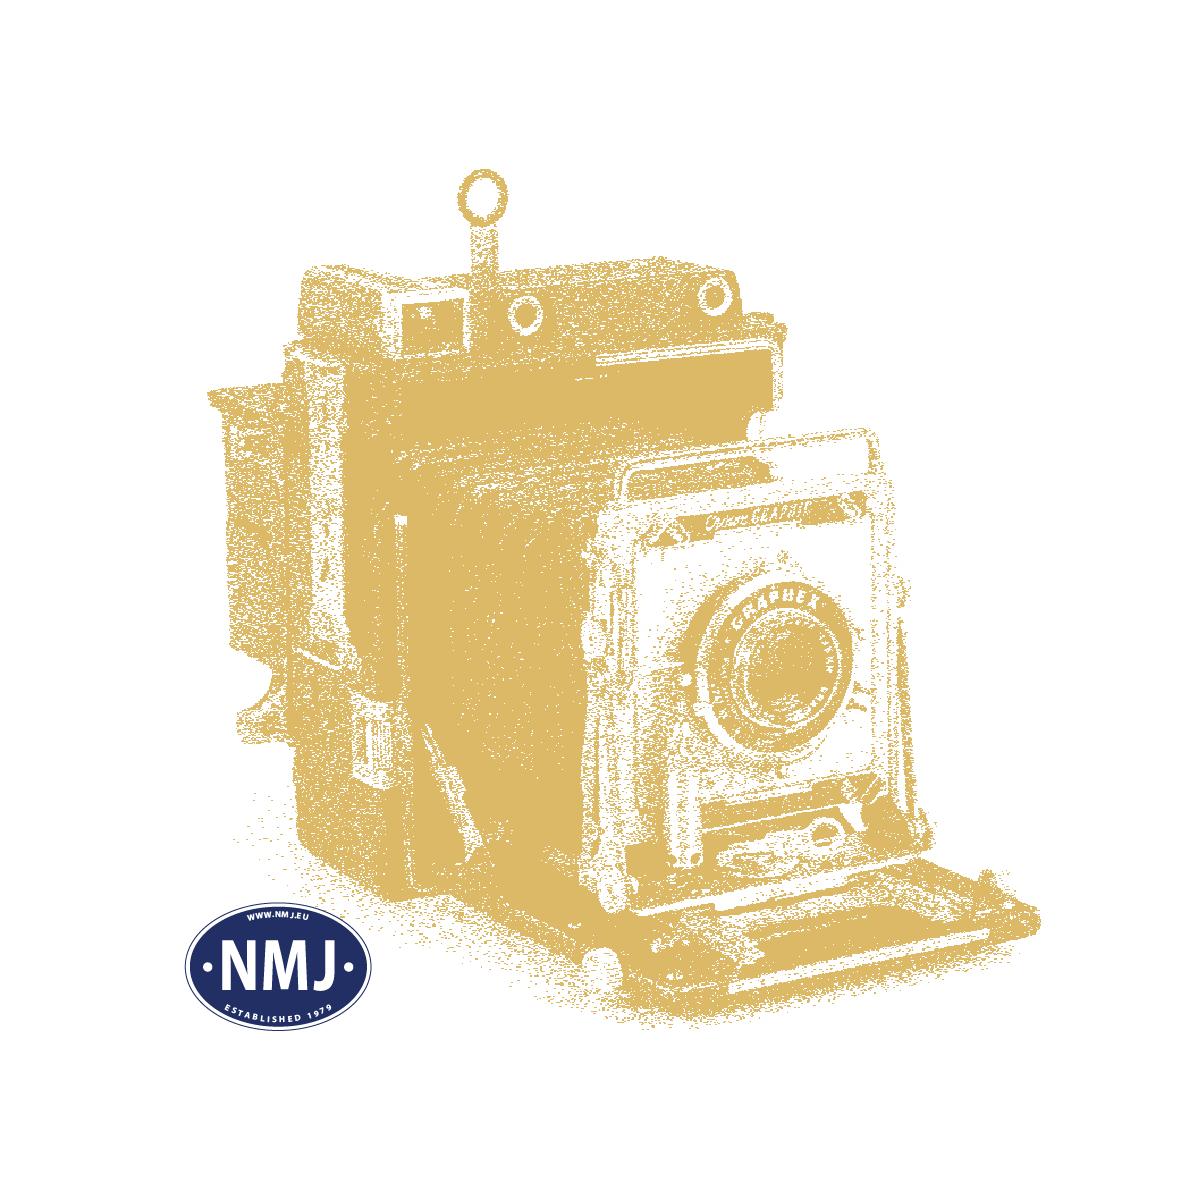 "NMJT132.305 - NMJ Topline NSB CB3 Type 2 21235 ""Barnetoget"", Nydesign"